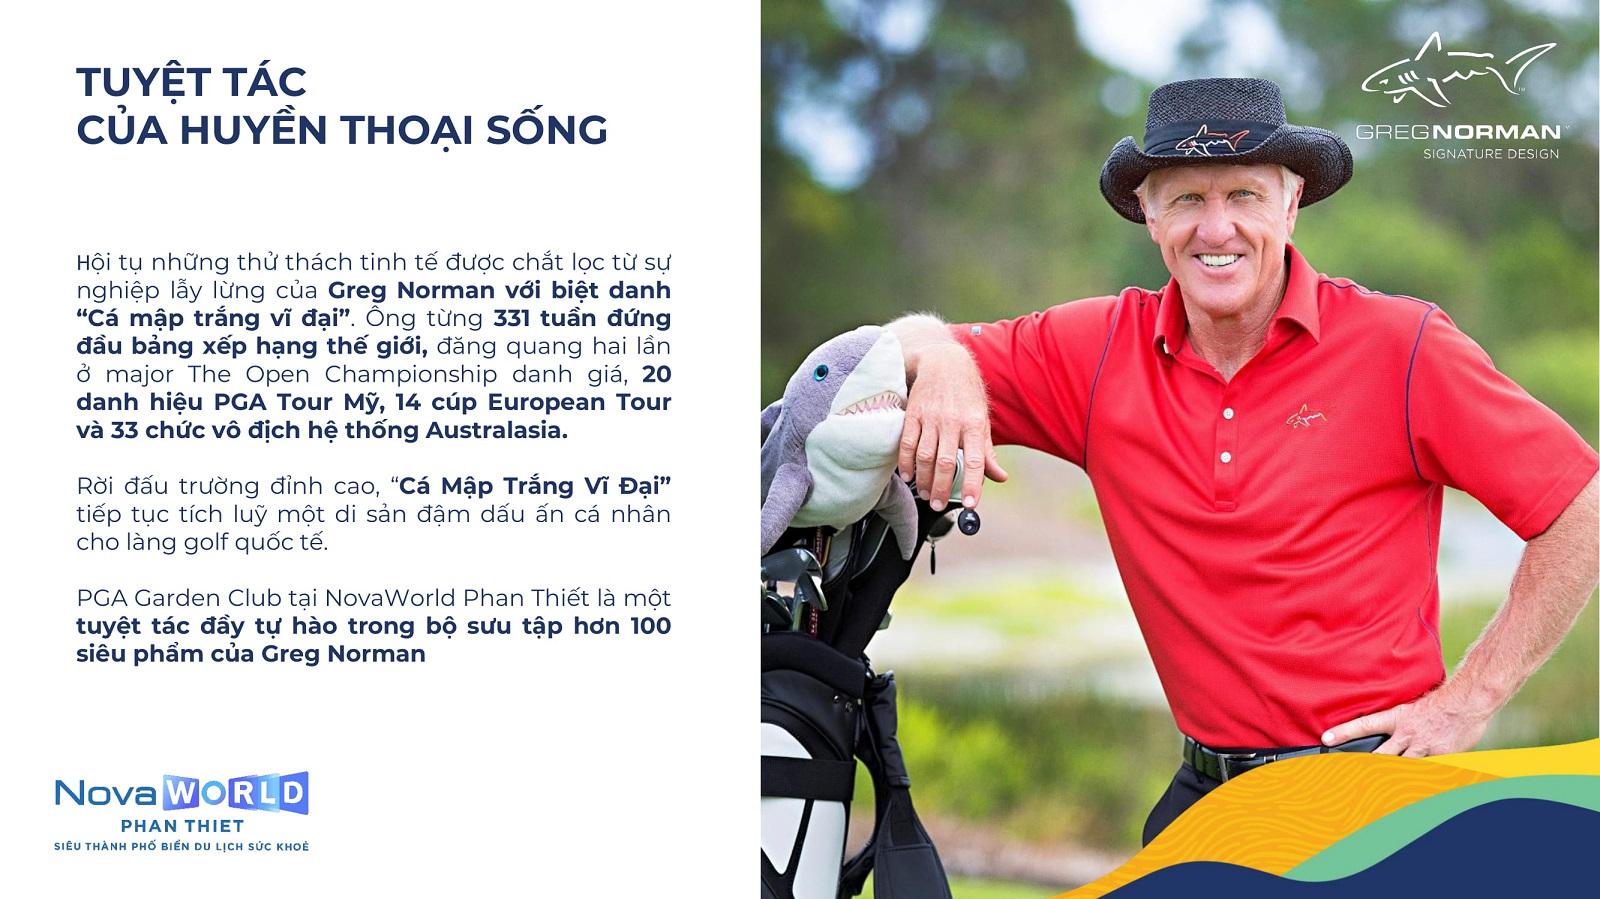 Huyền thoại Golf Greg Norman